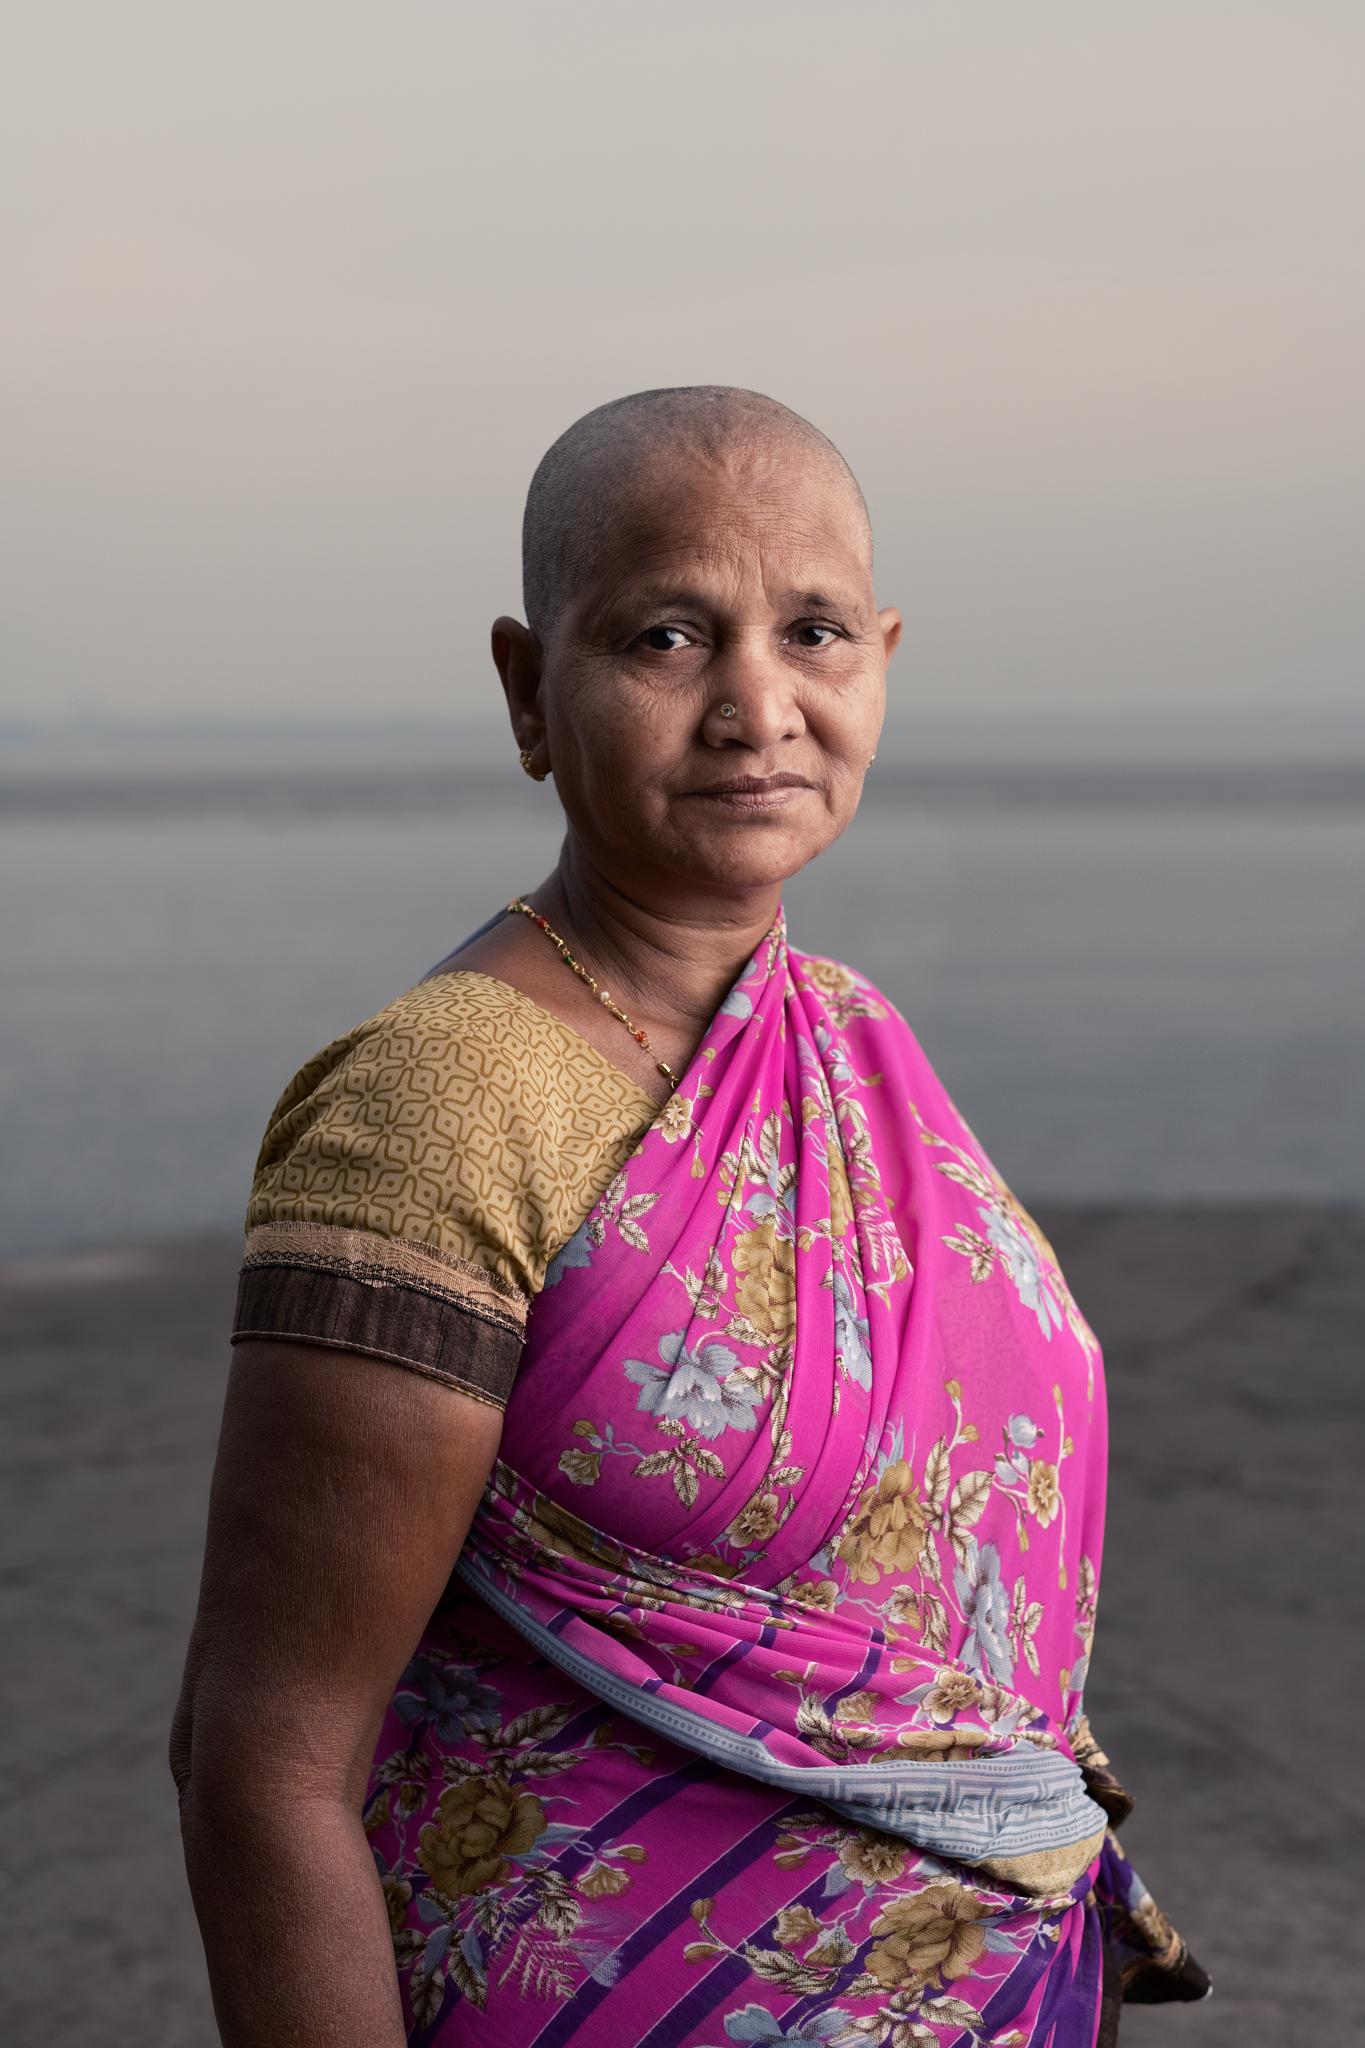 Varanasi_portrait_travel_photography_Manchester_Adventure_Photographer_Jan_Bella14.jpg